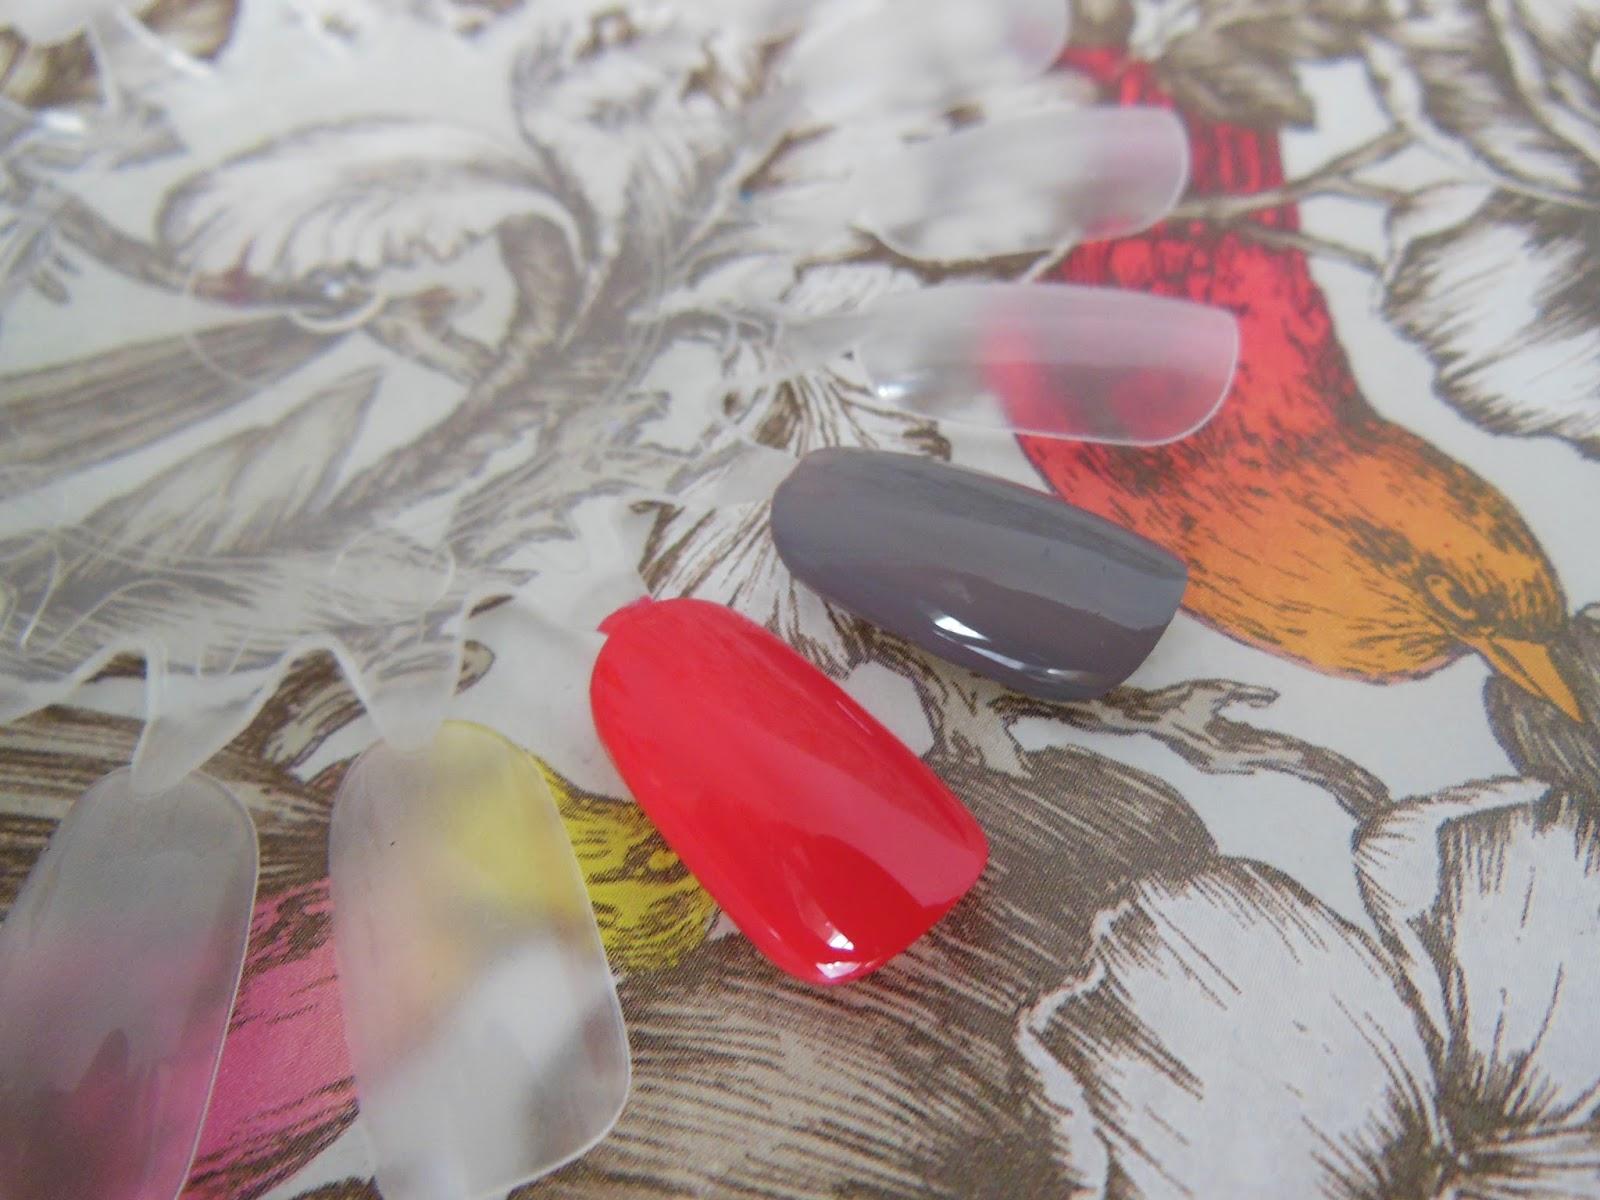 Dr Lewinn's renunail triple strength nail colours pomegranate and graphite swatches